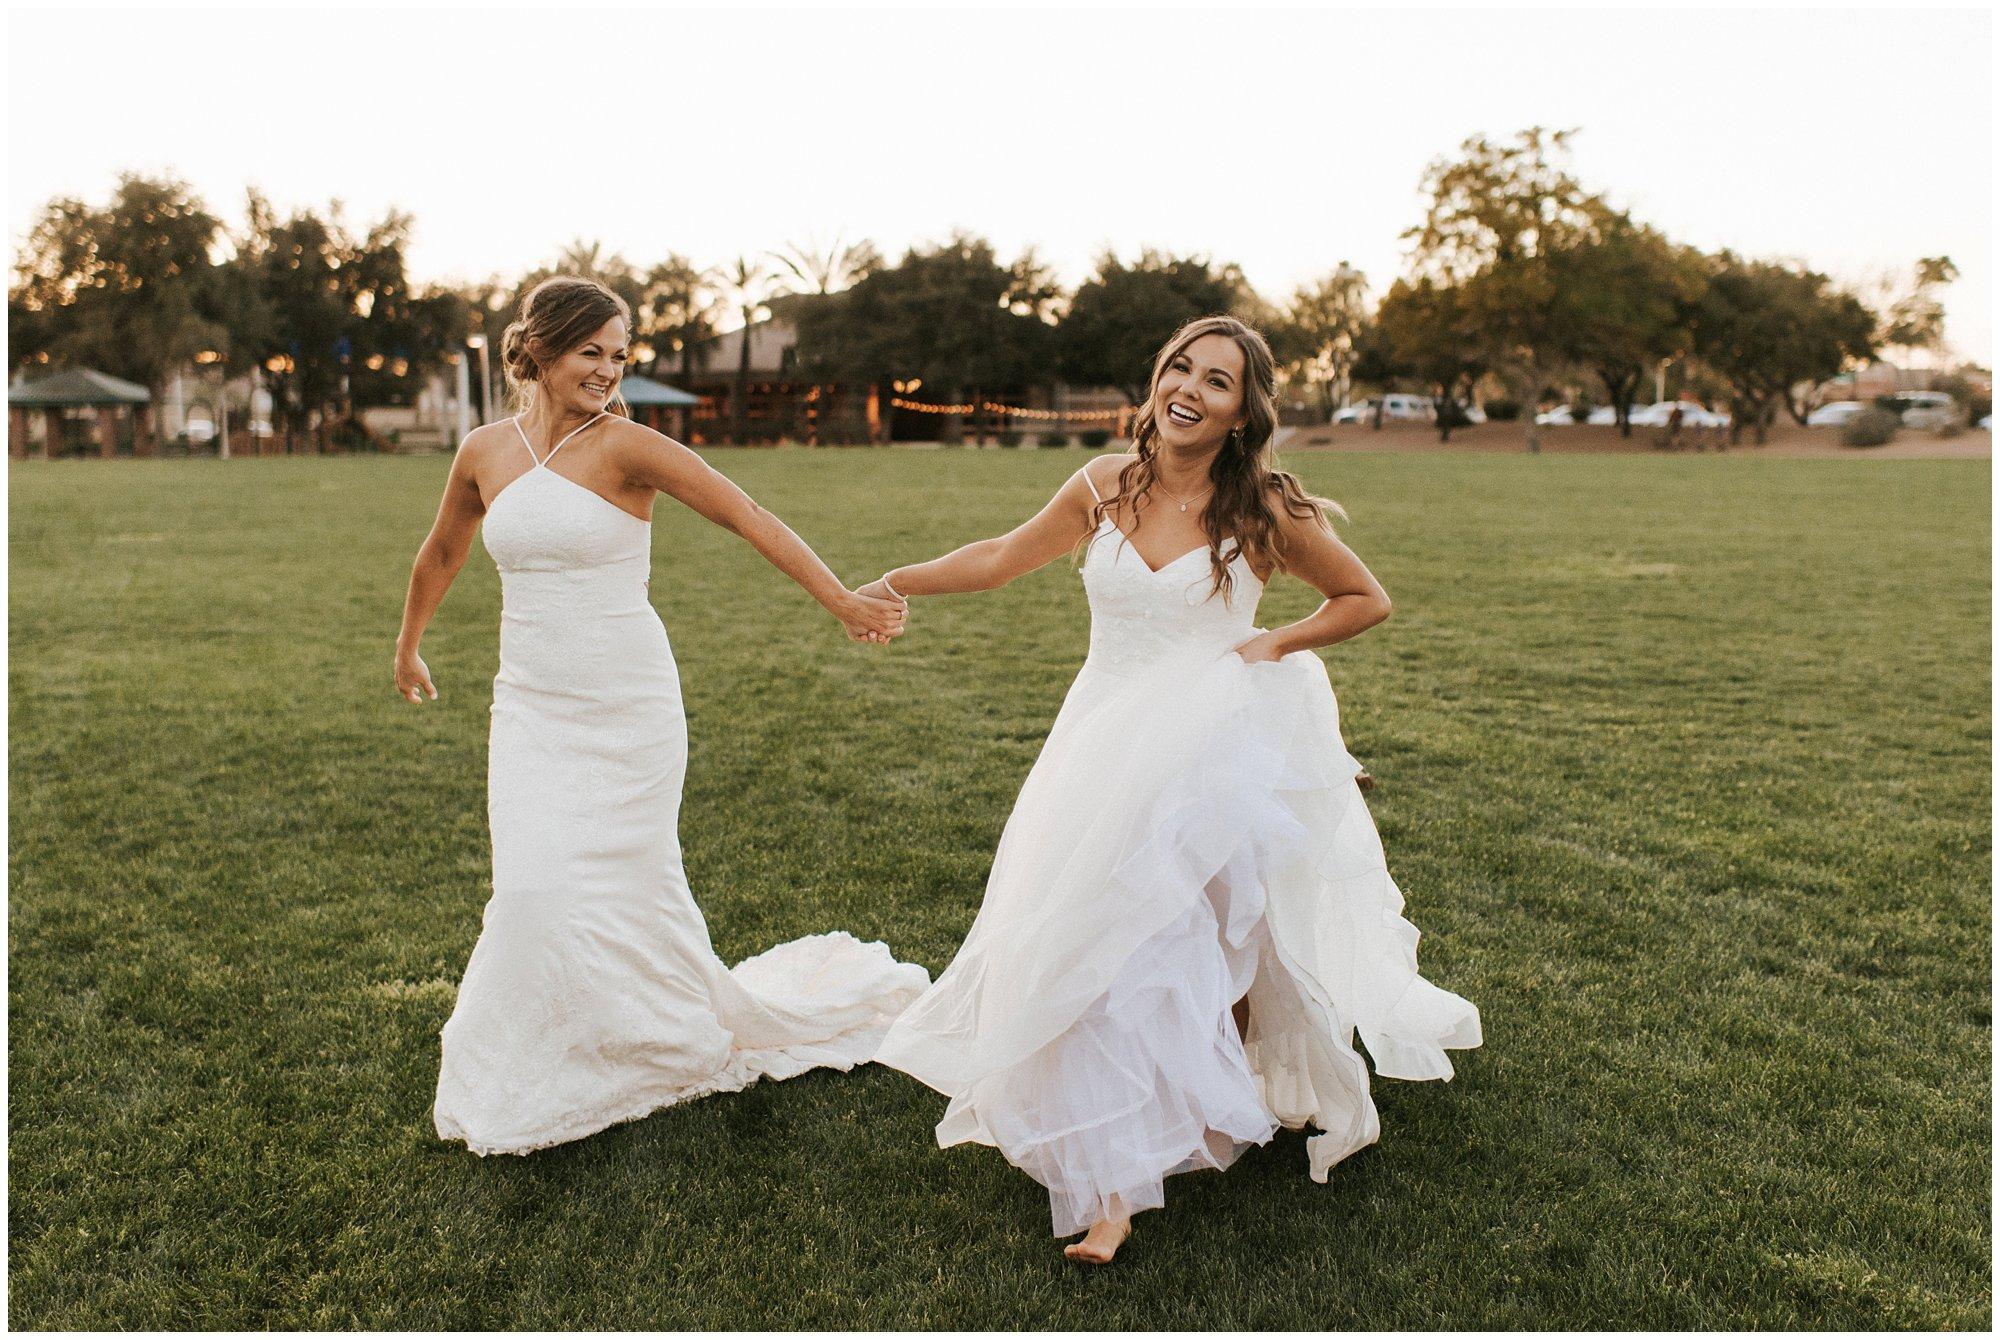 arizona same sex wedding photographer - jenni and lauren wedding the islands clubhouse_0096.jpg